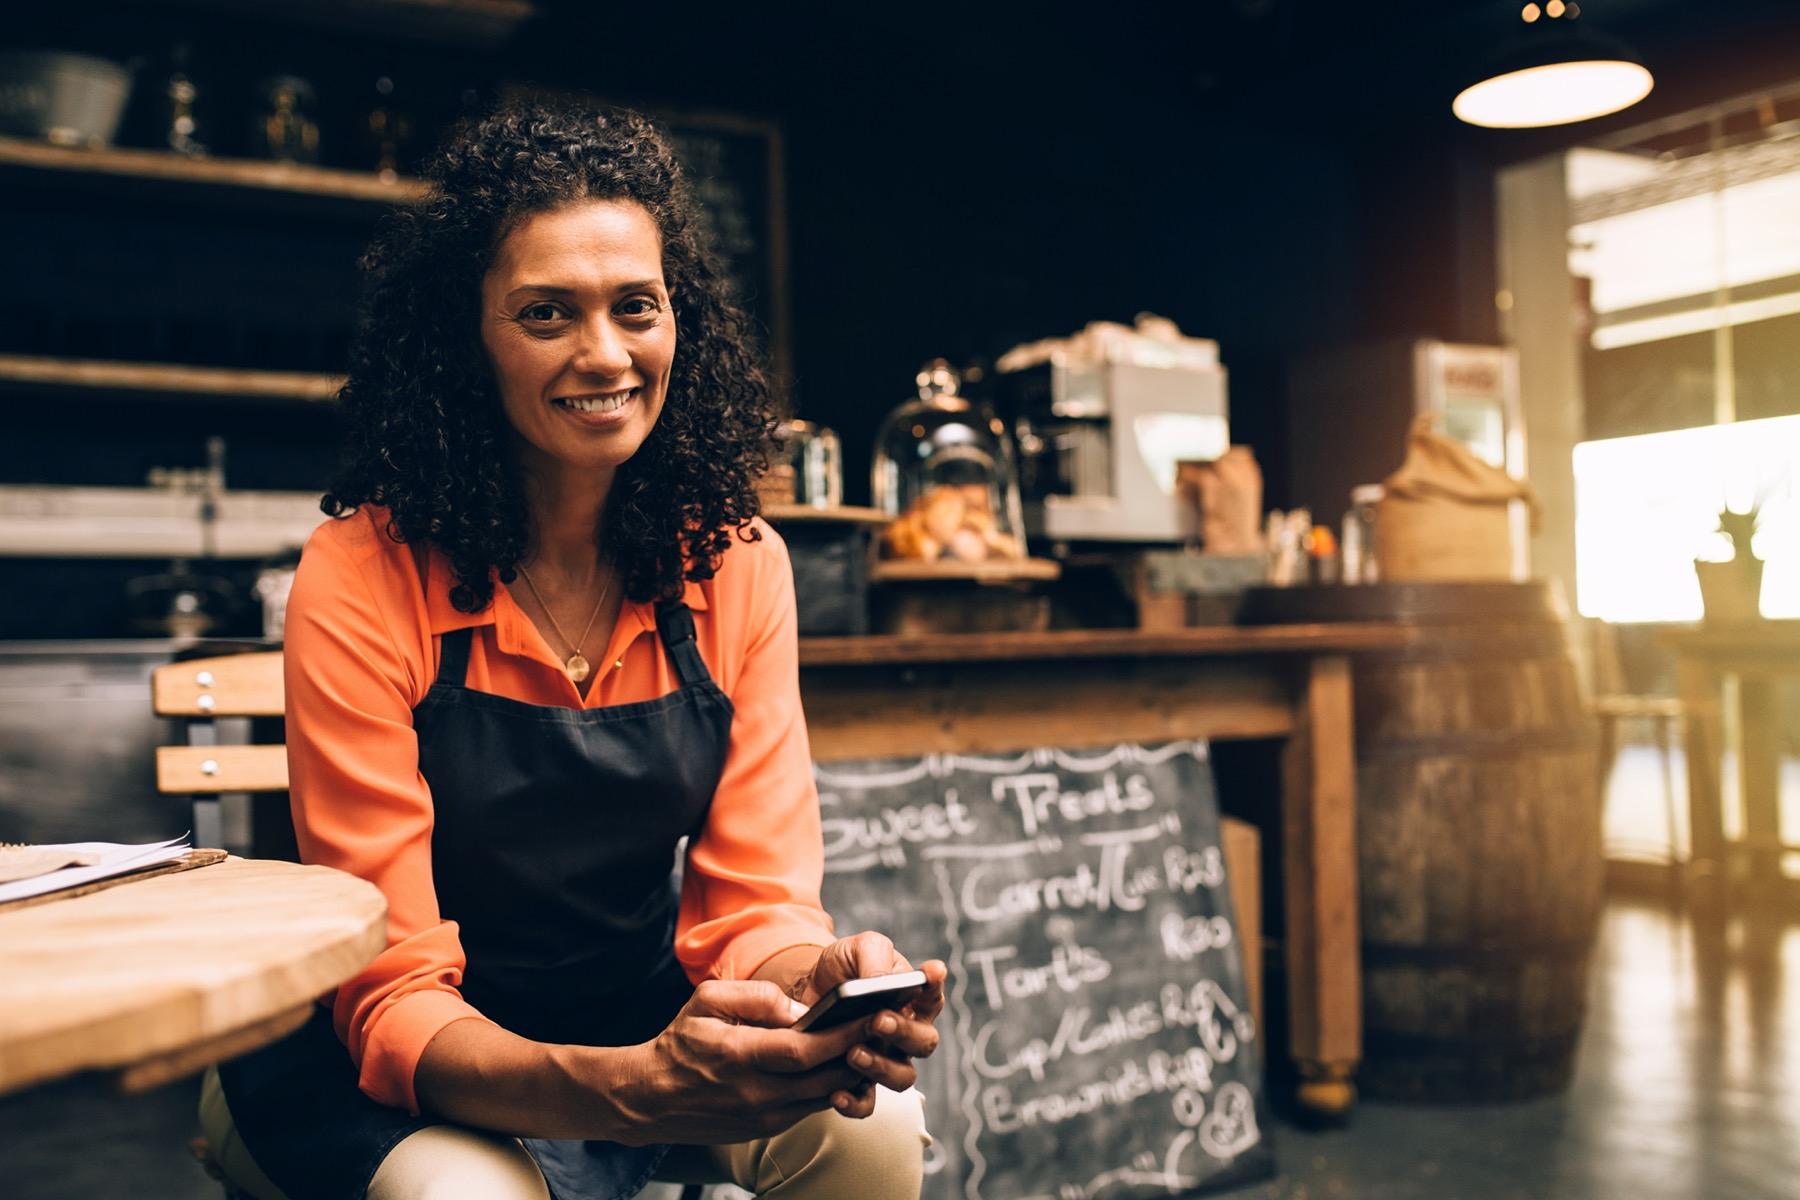 Restaurant employee doing workforce training on mobile phone